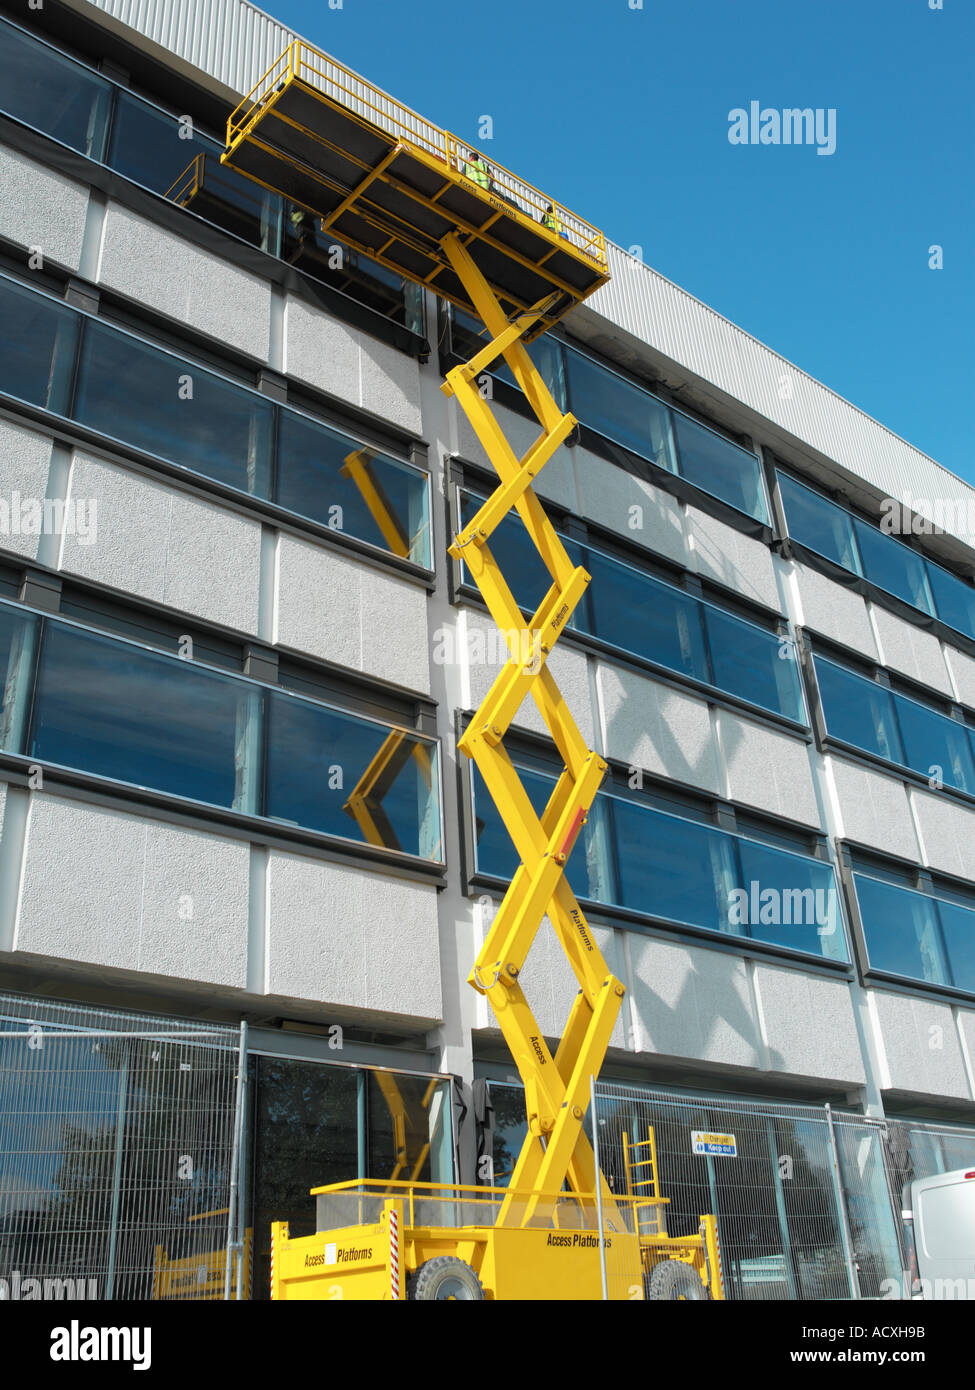 scissor lift working on glass building Stock Photo: 4323738 - Alamy